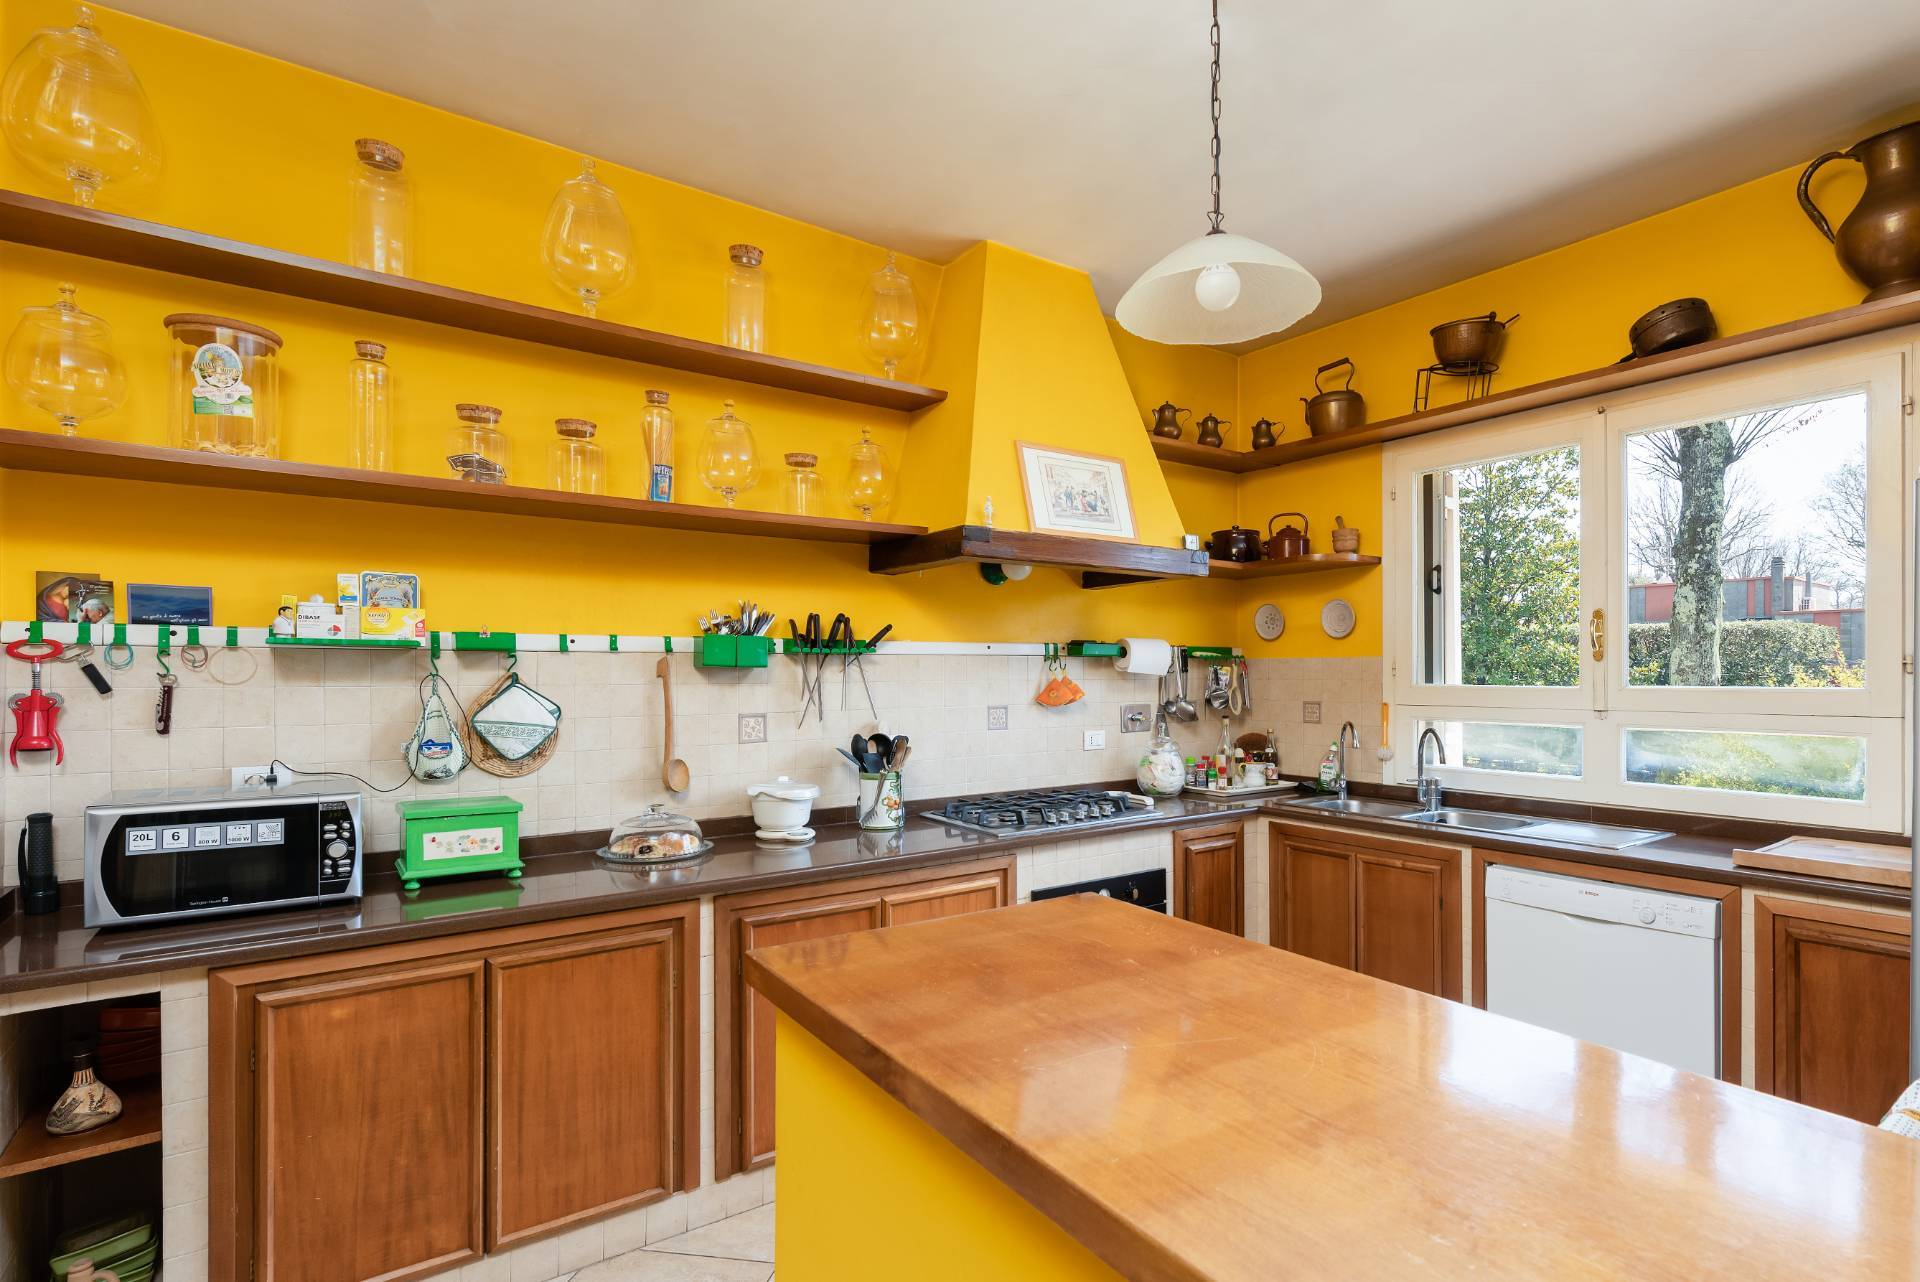 Villa in Vendita a Ariccia: 5 locali, 583 mq - Foto 8